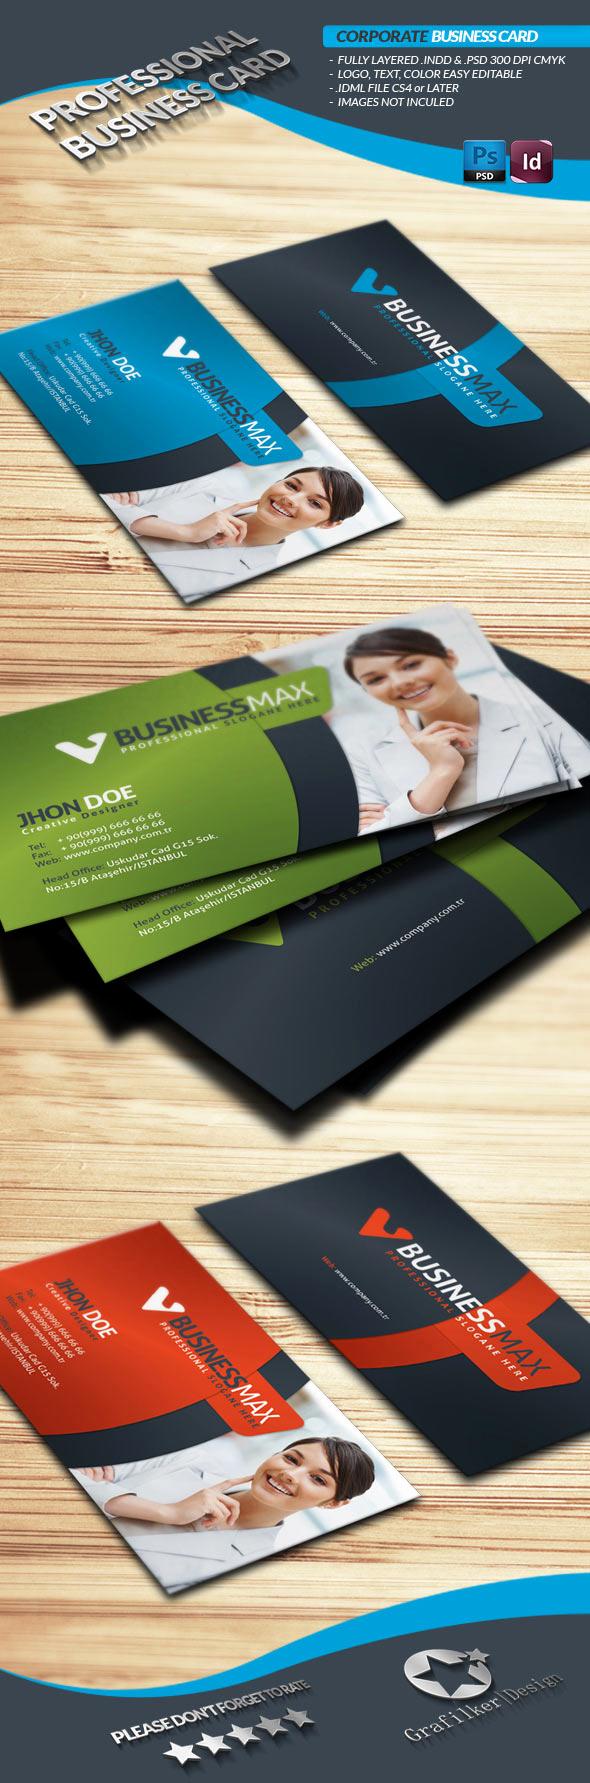 Business Card Illustrator Template Fresh 15 Premium Business Card Templates In Shop